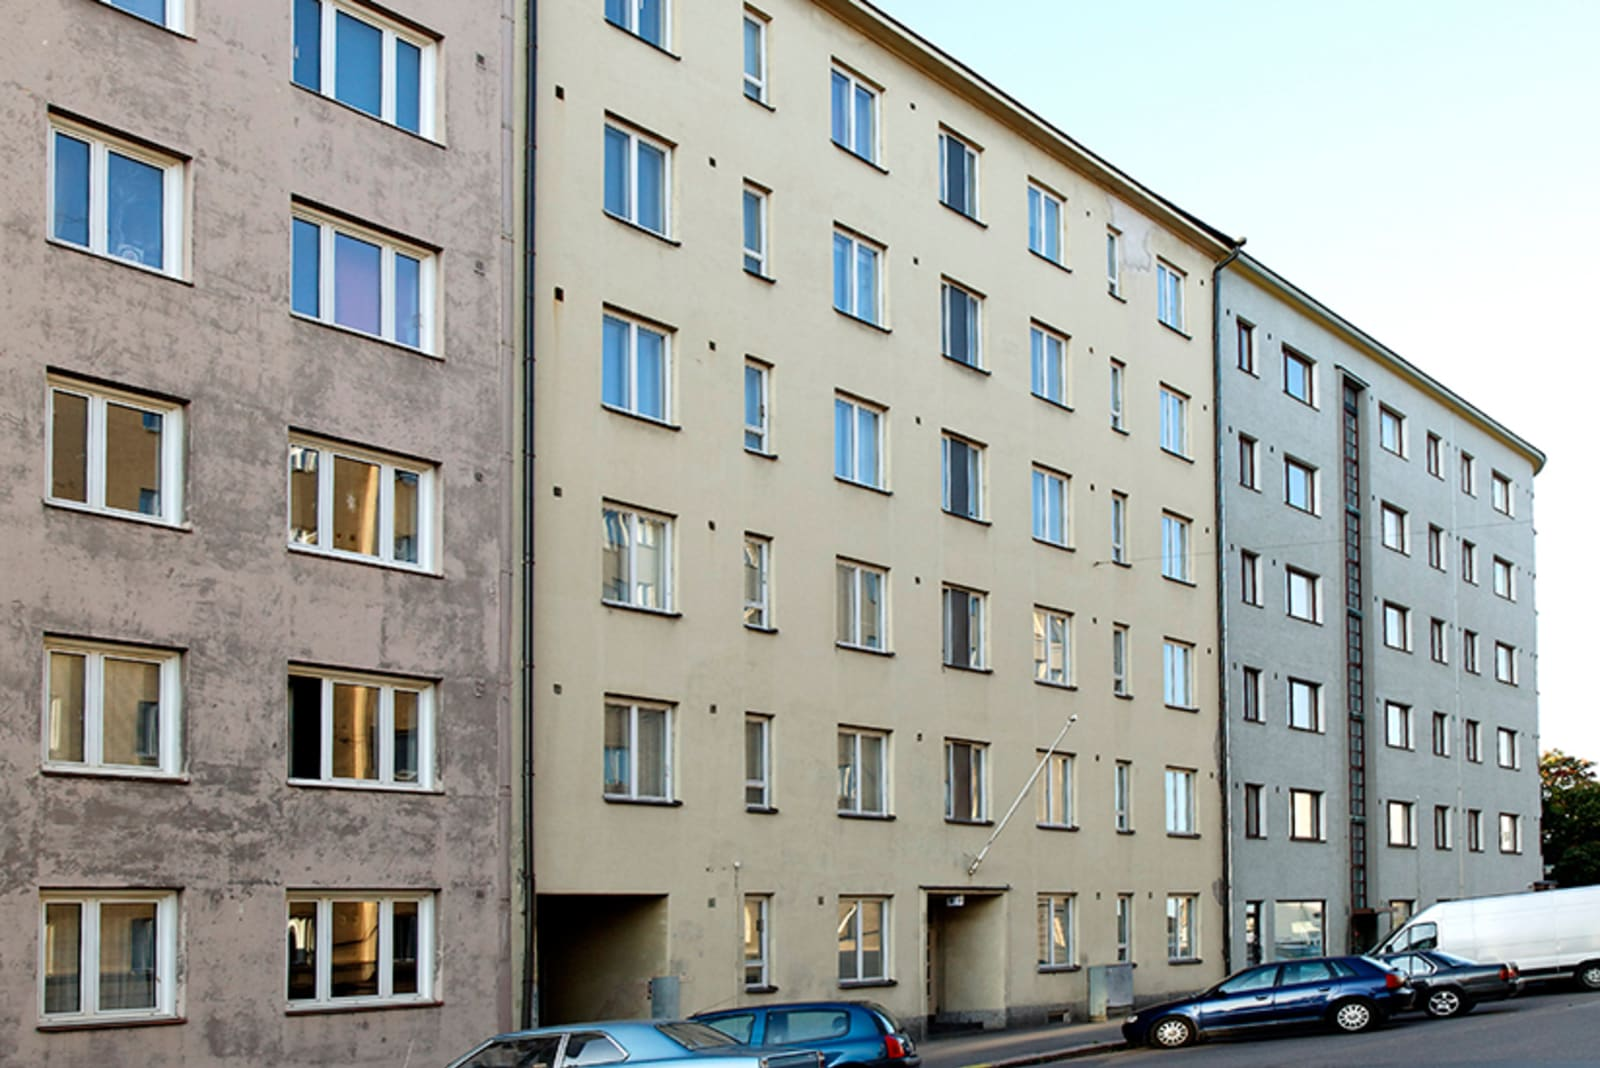 Helsinki, Taka-Töölö, Messeniuksenkatu 8